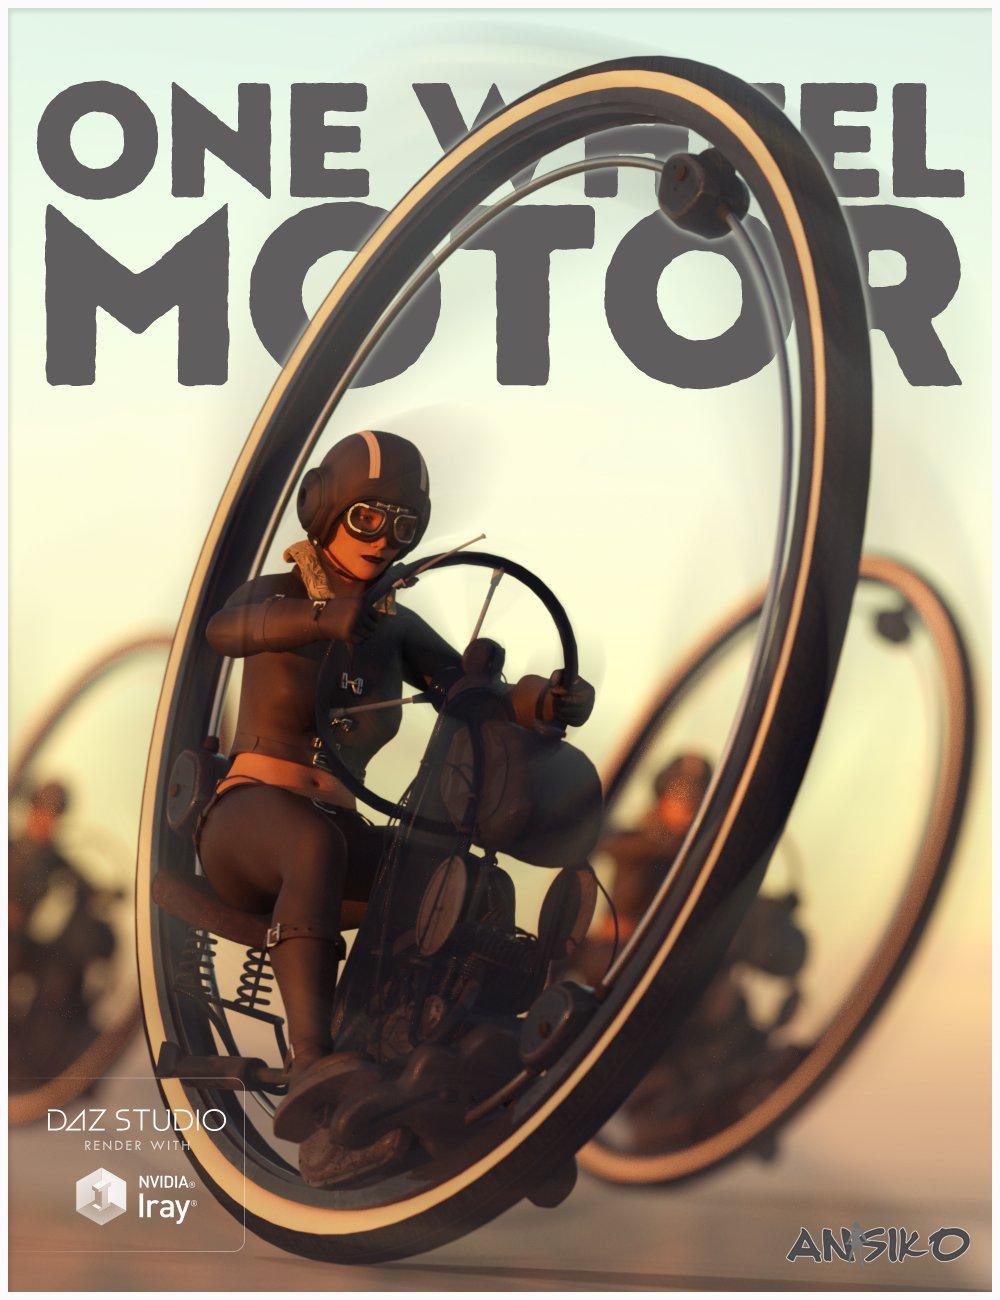 One Wheel Motor_DAZ3D下载站